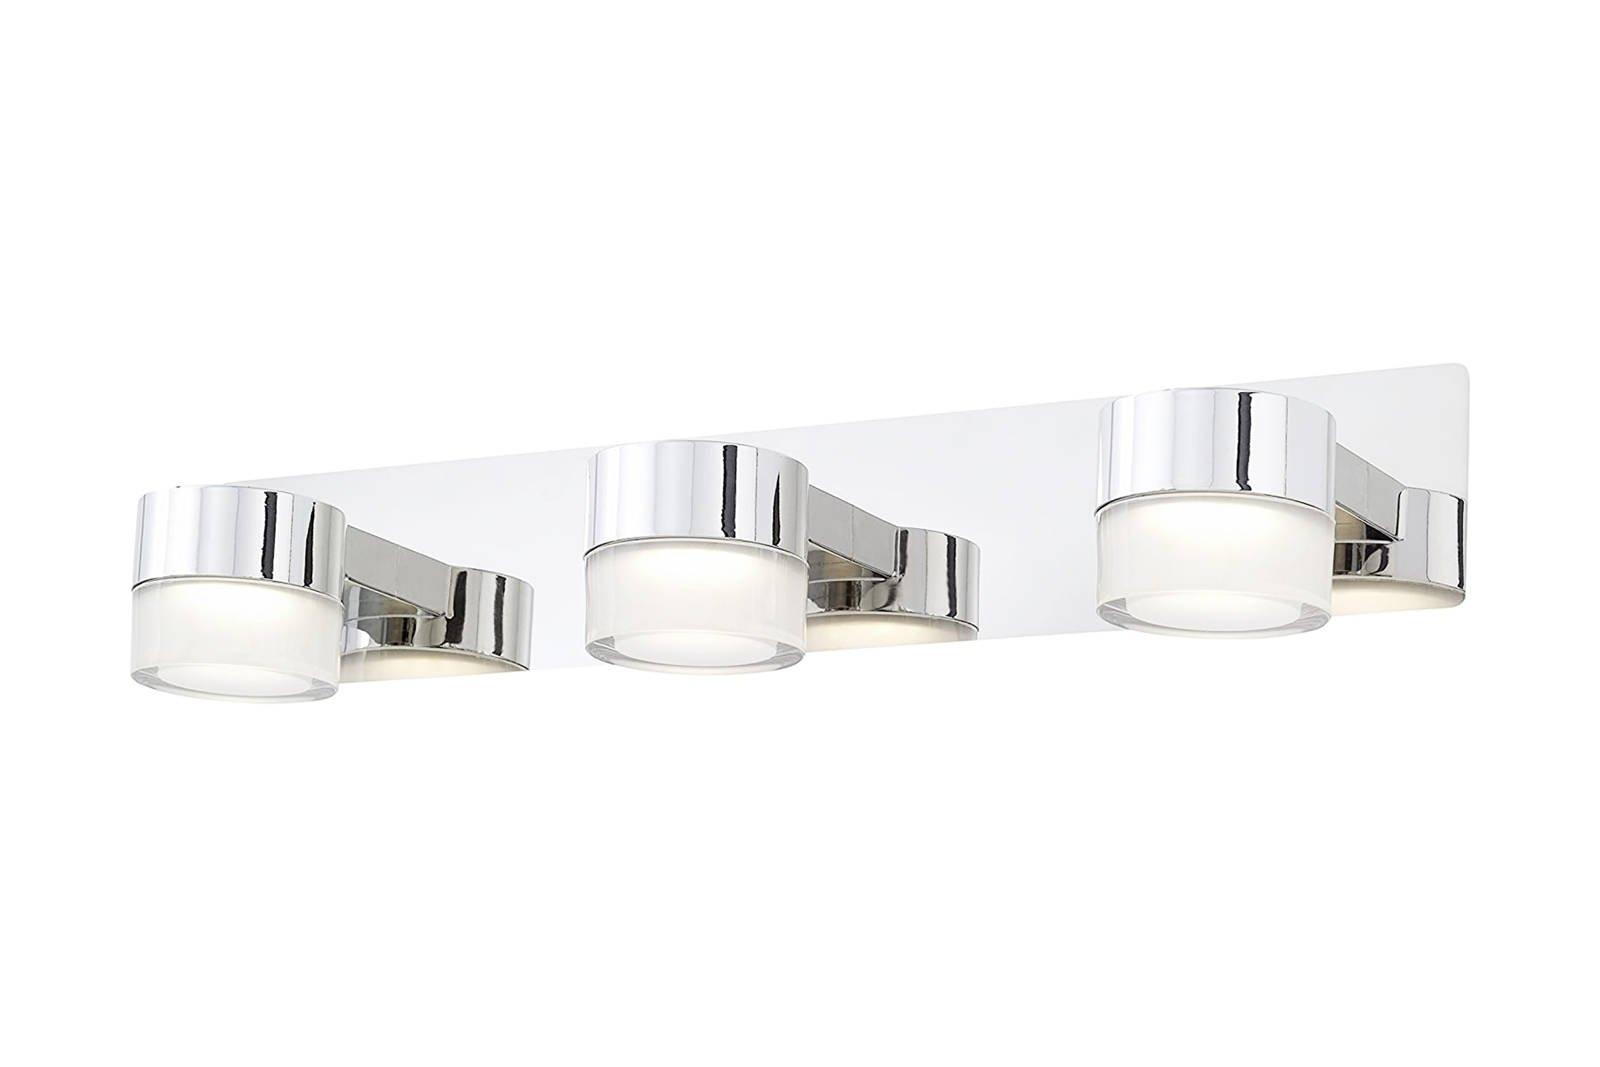 Wandleuchte über dem Spiegel Briloner 2247-038 15W LED